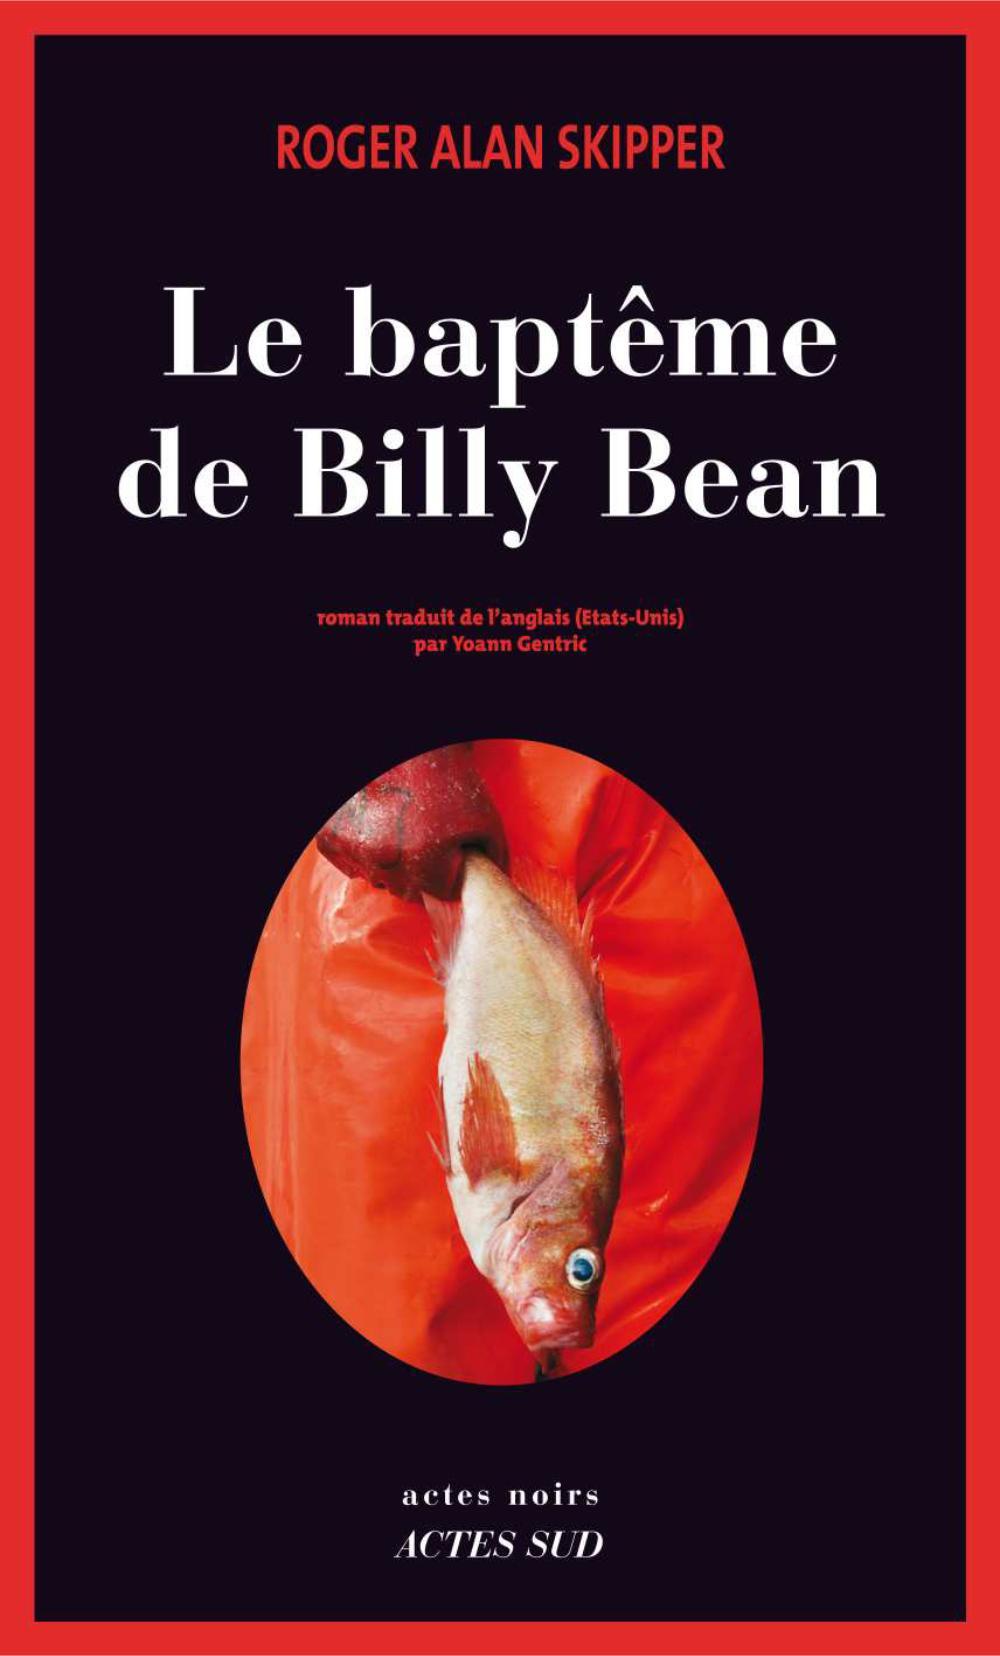 Le baptême de Billy Bean